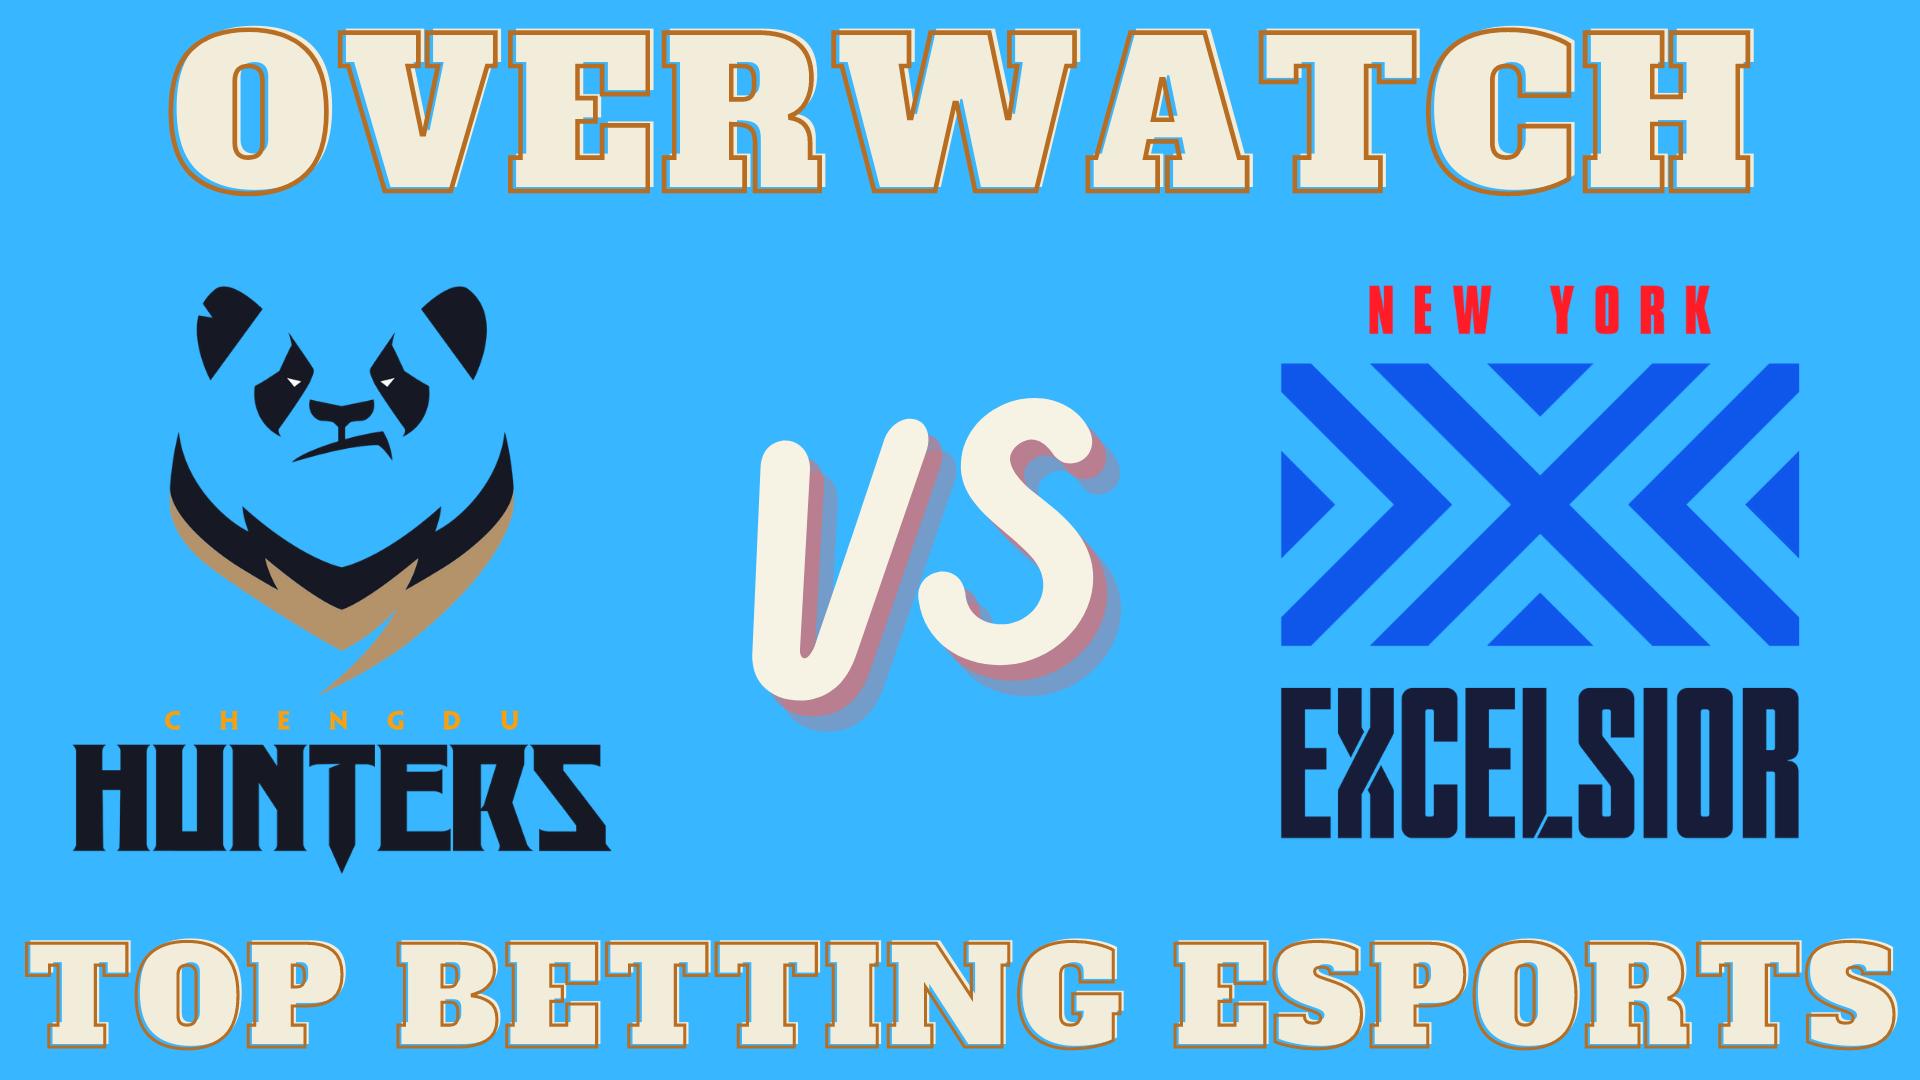 Chengdu Hunters vs New York Excelsior Betting prediction